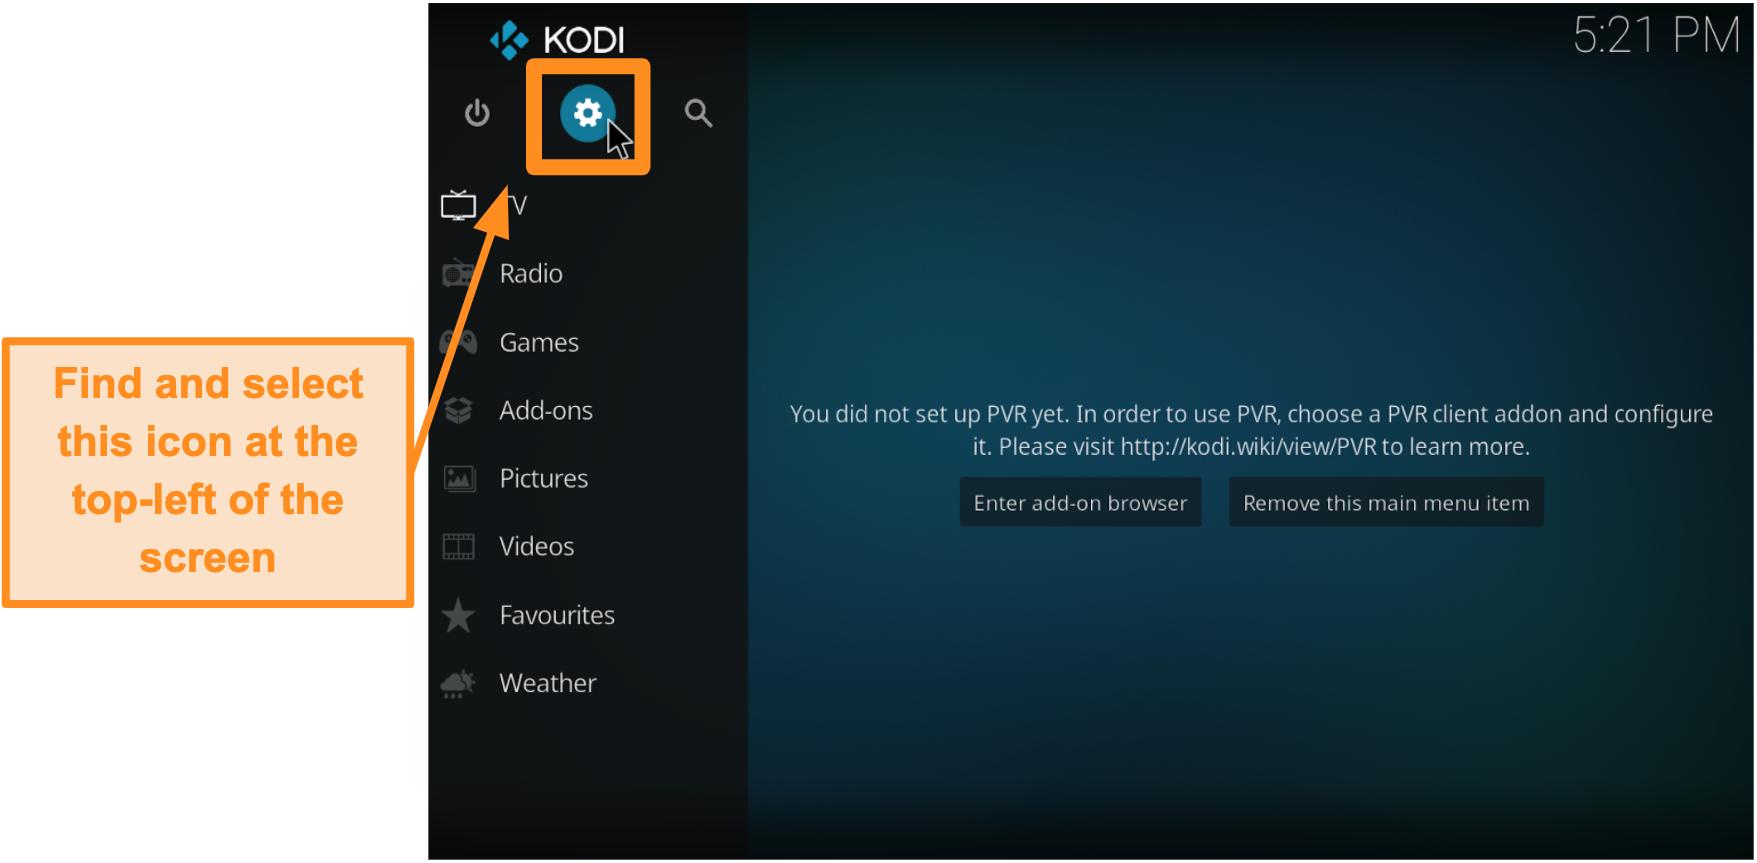 screenshot-how-to-install-third-party-kodi-addon-step-2-click-box-icon